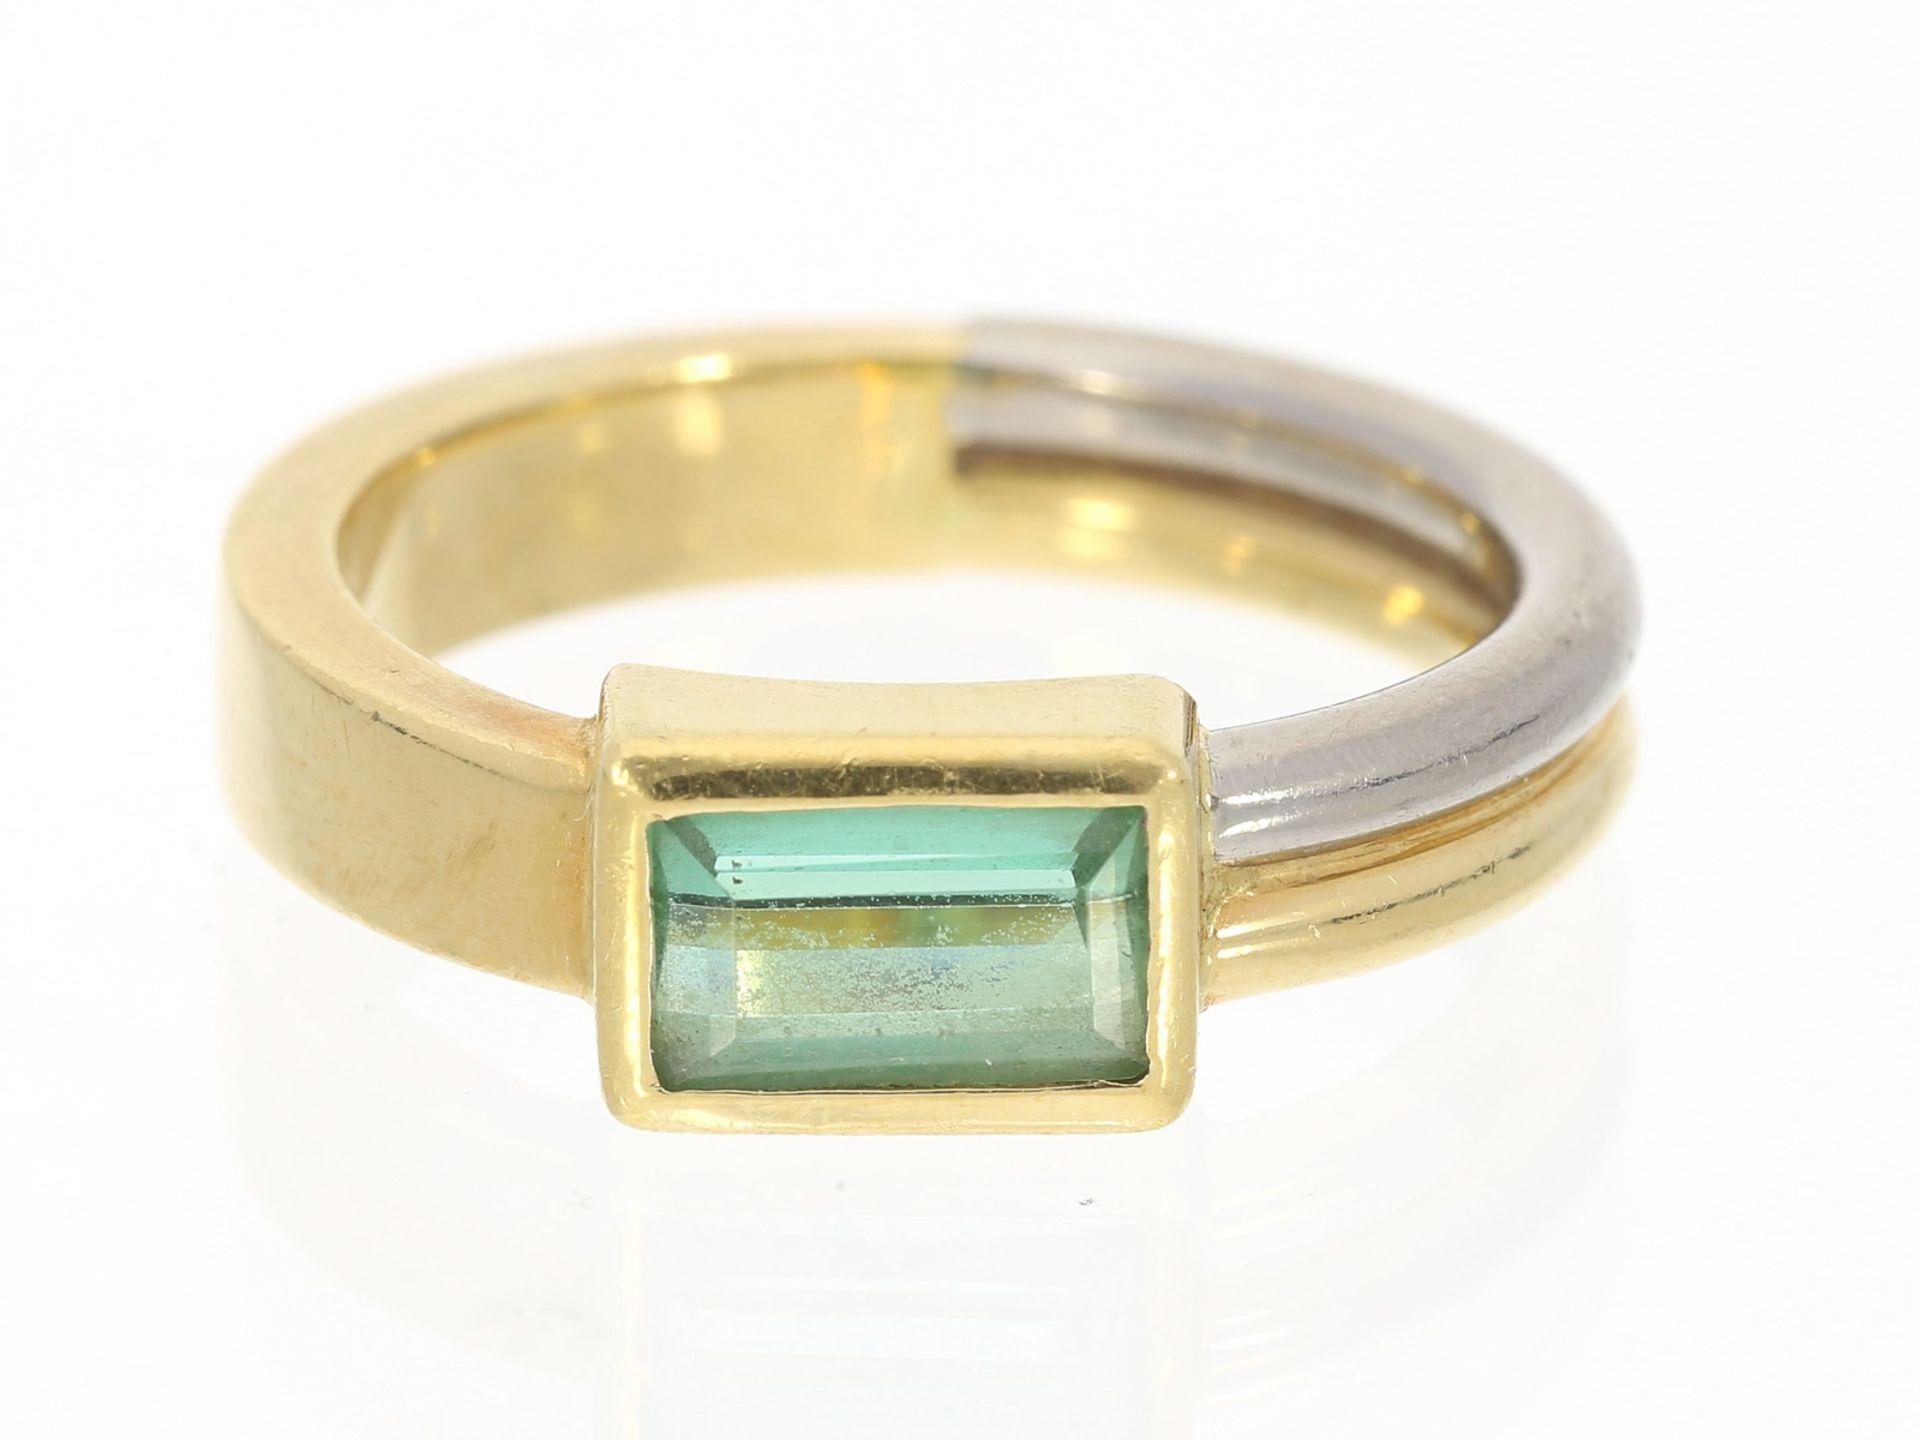 Ring: interessanter und solide gefertigter Turmalin-Goldschmiedering, 18K Gold, geschätzter Gol